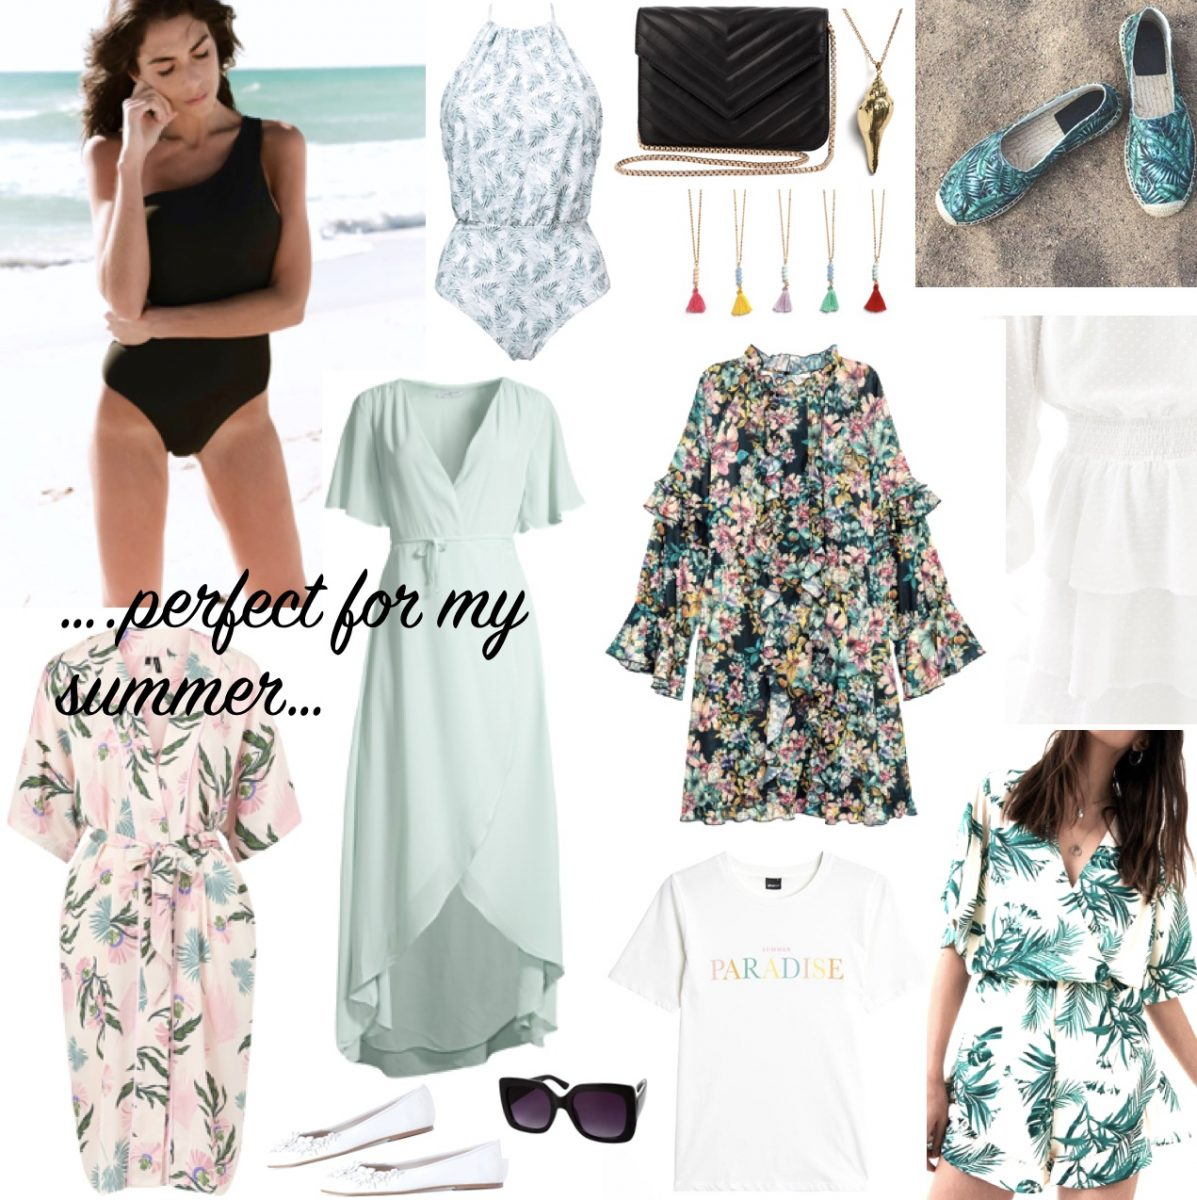 496f56174fef Some more fashion …